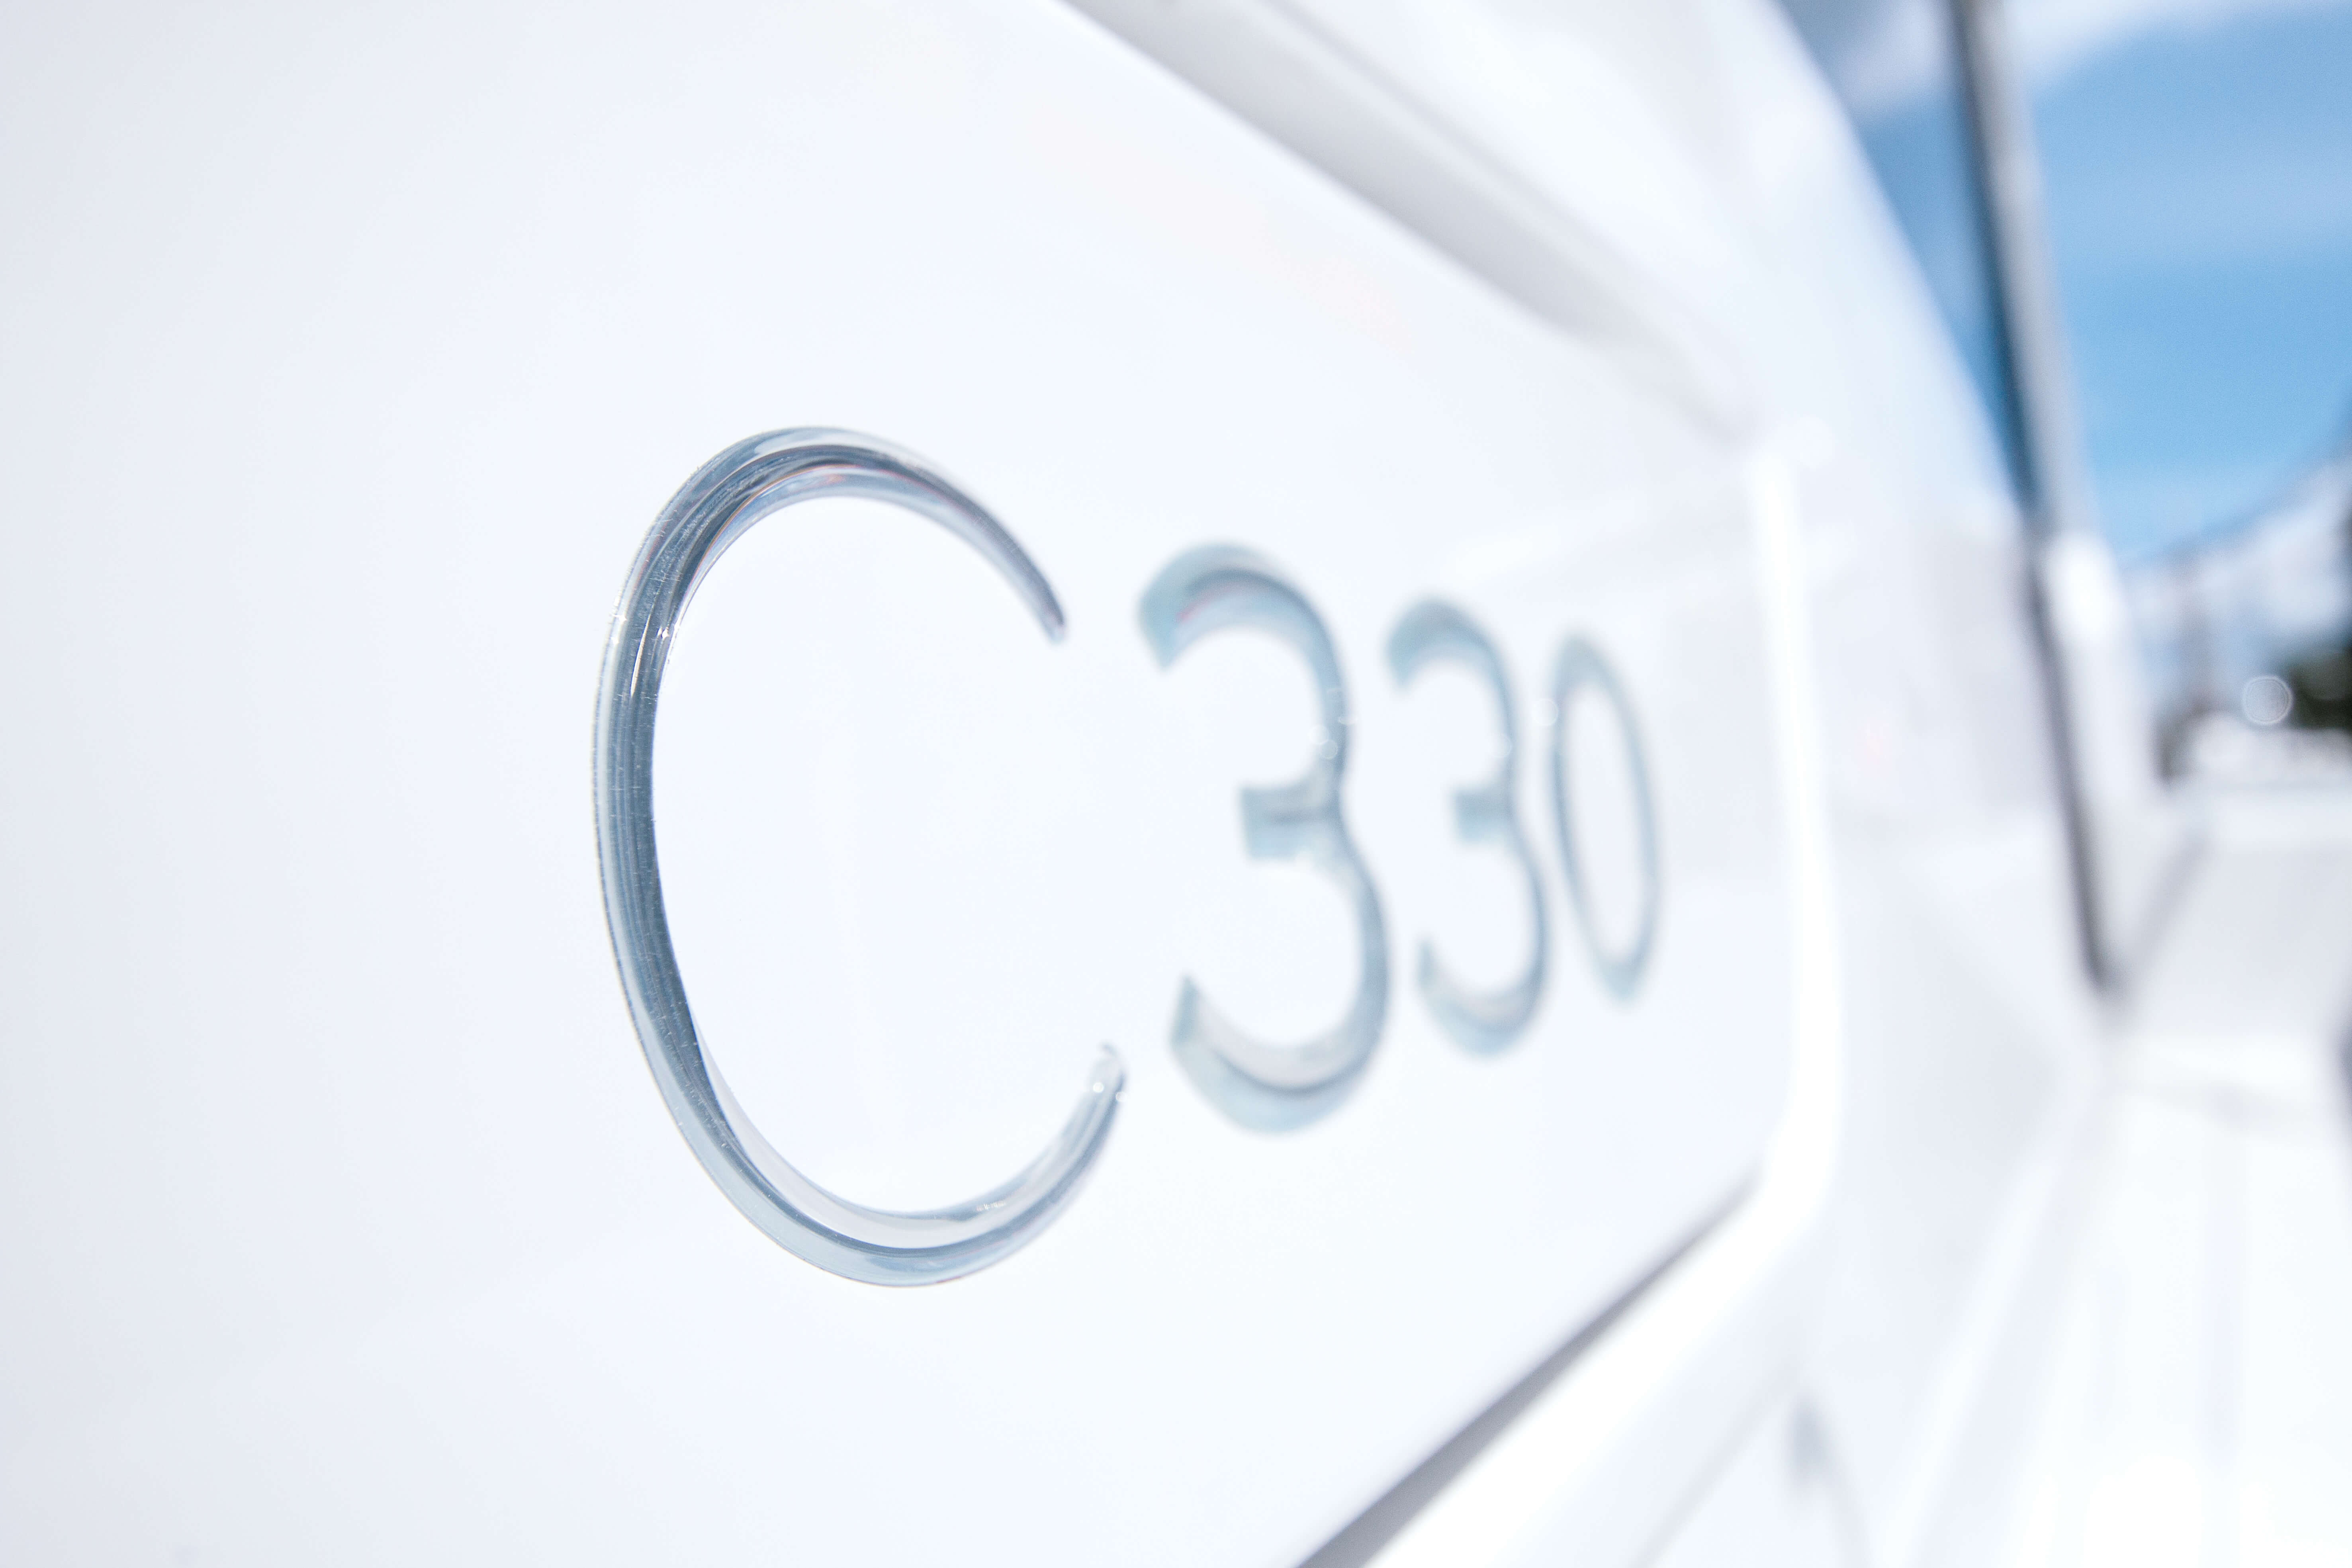 Sealine_C330_Exterieur_150730_10.jpg